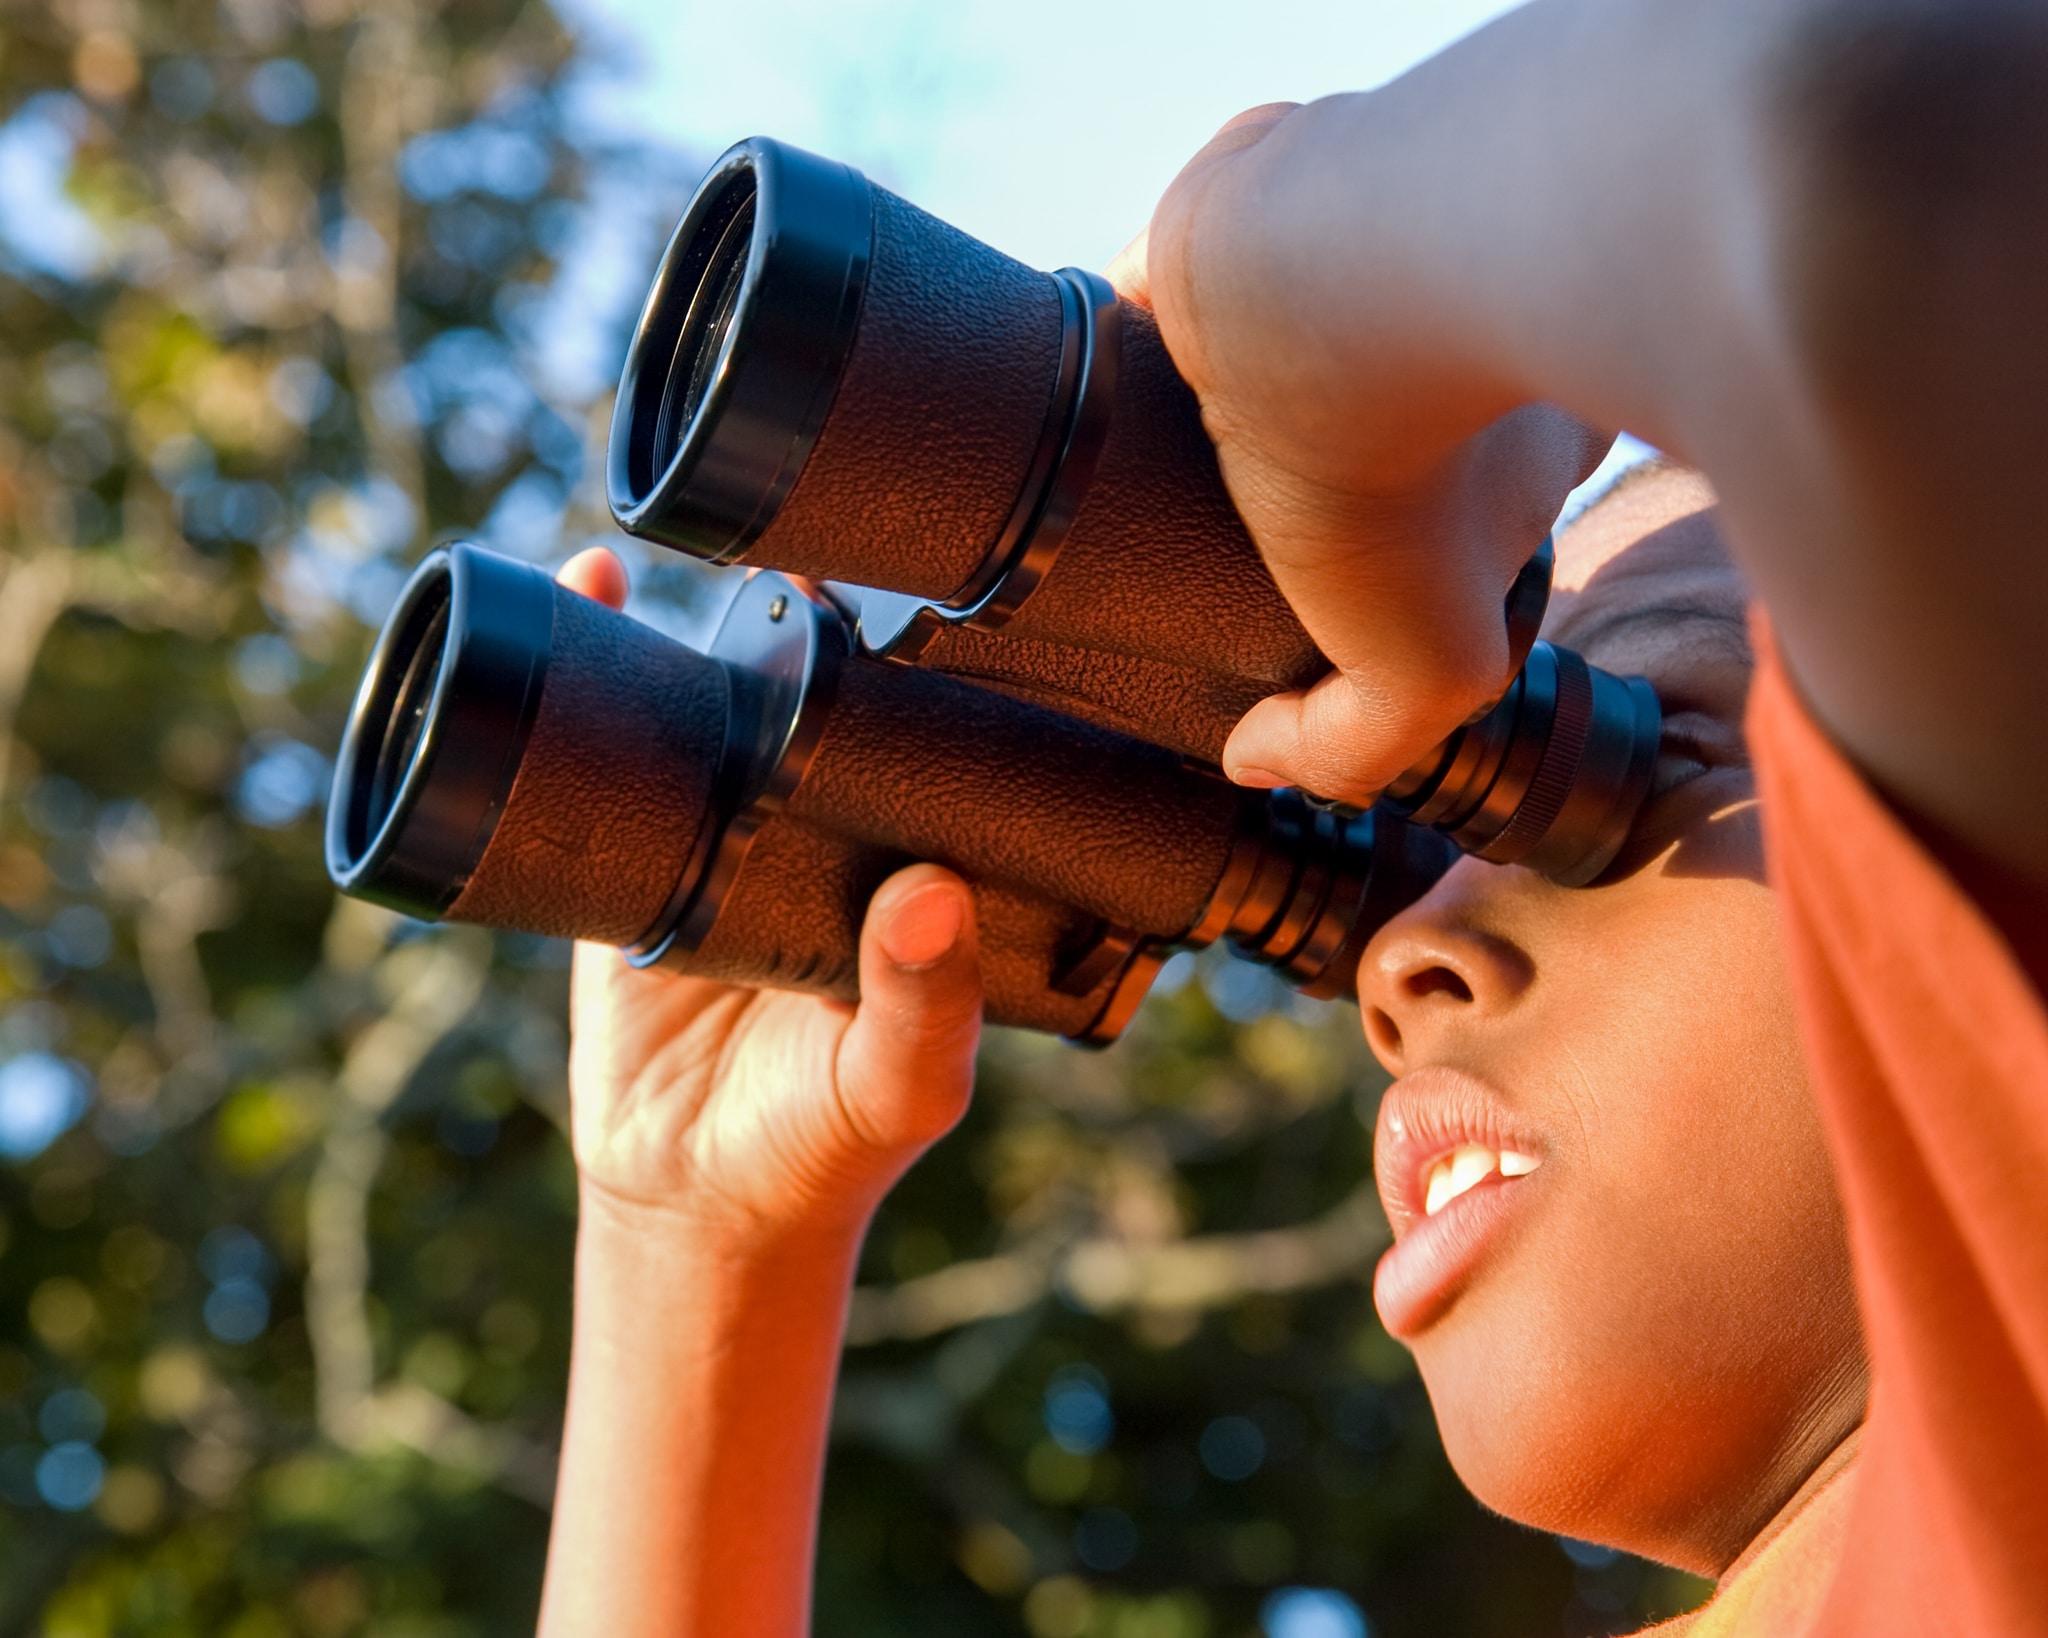 a boy looking through binoculars